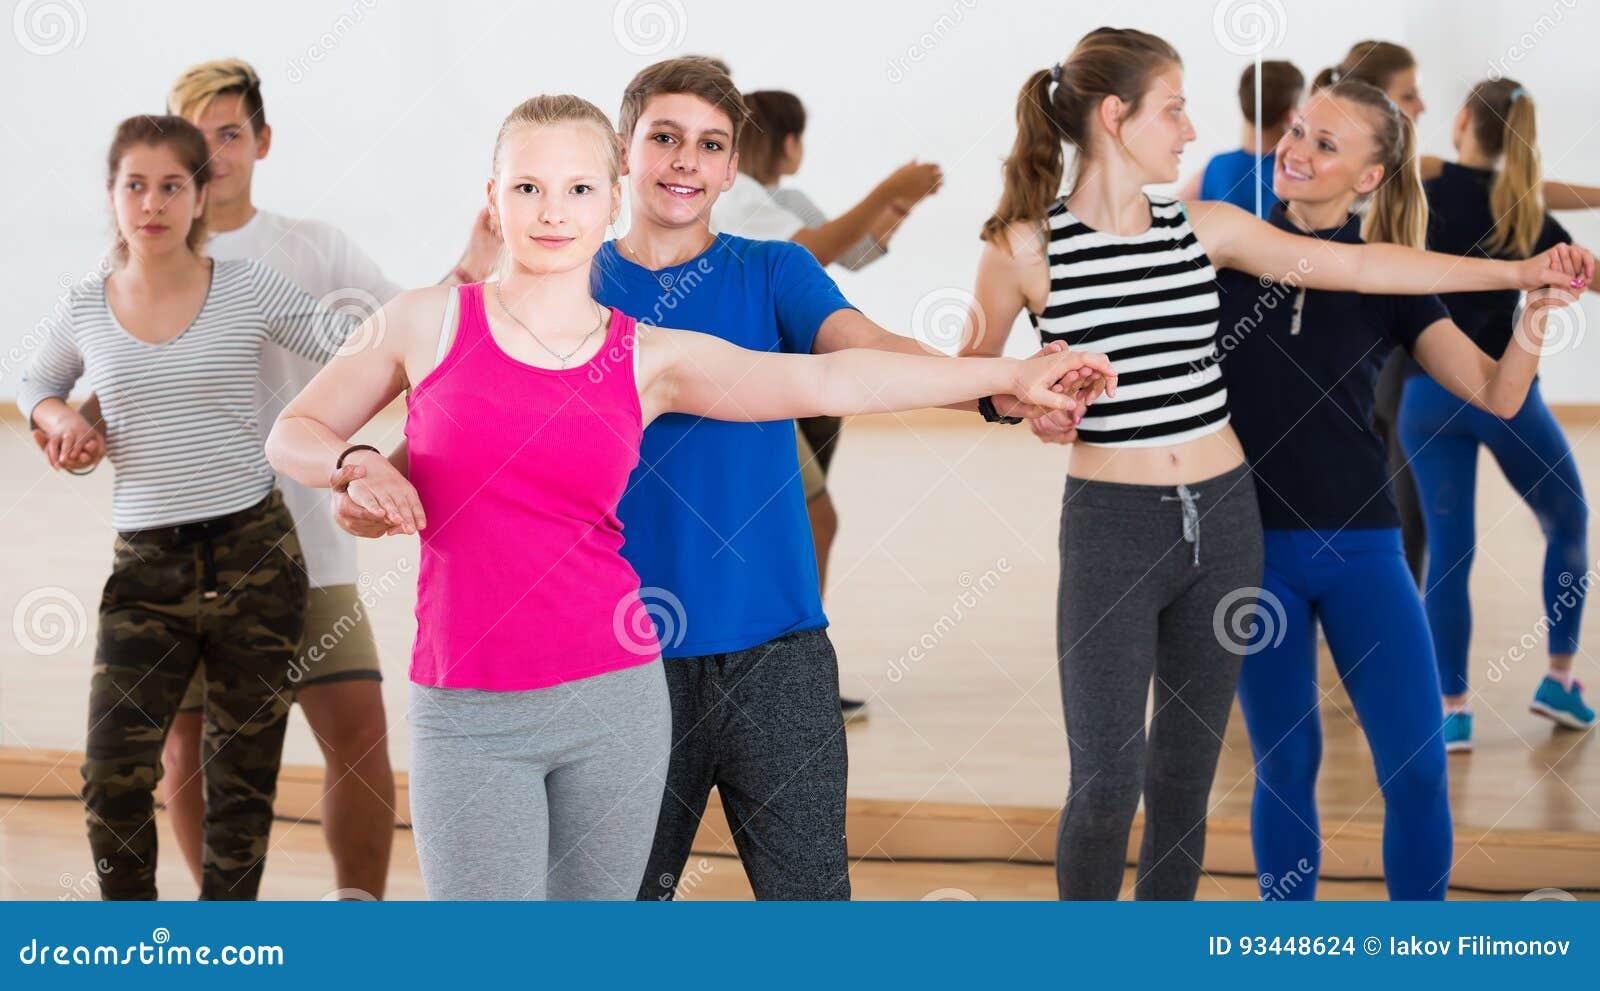 free-group-teen-photo